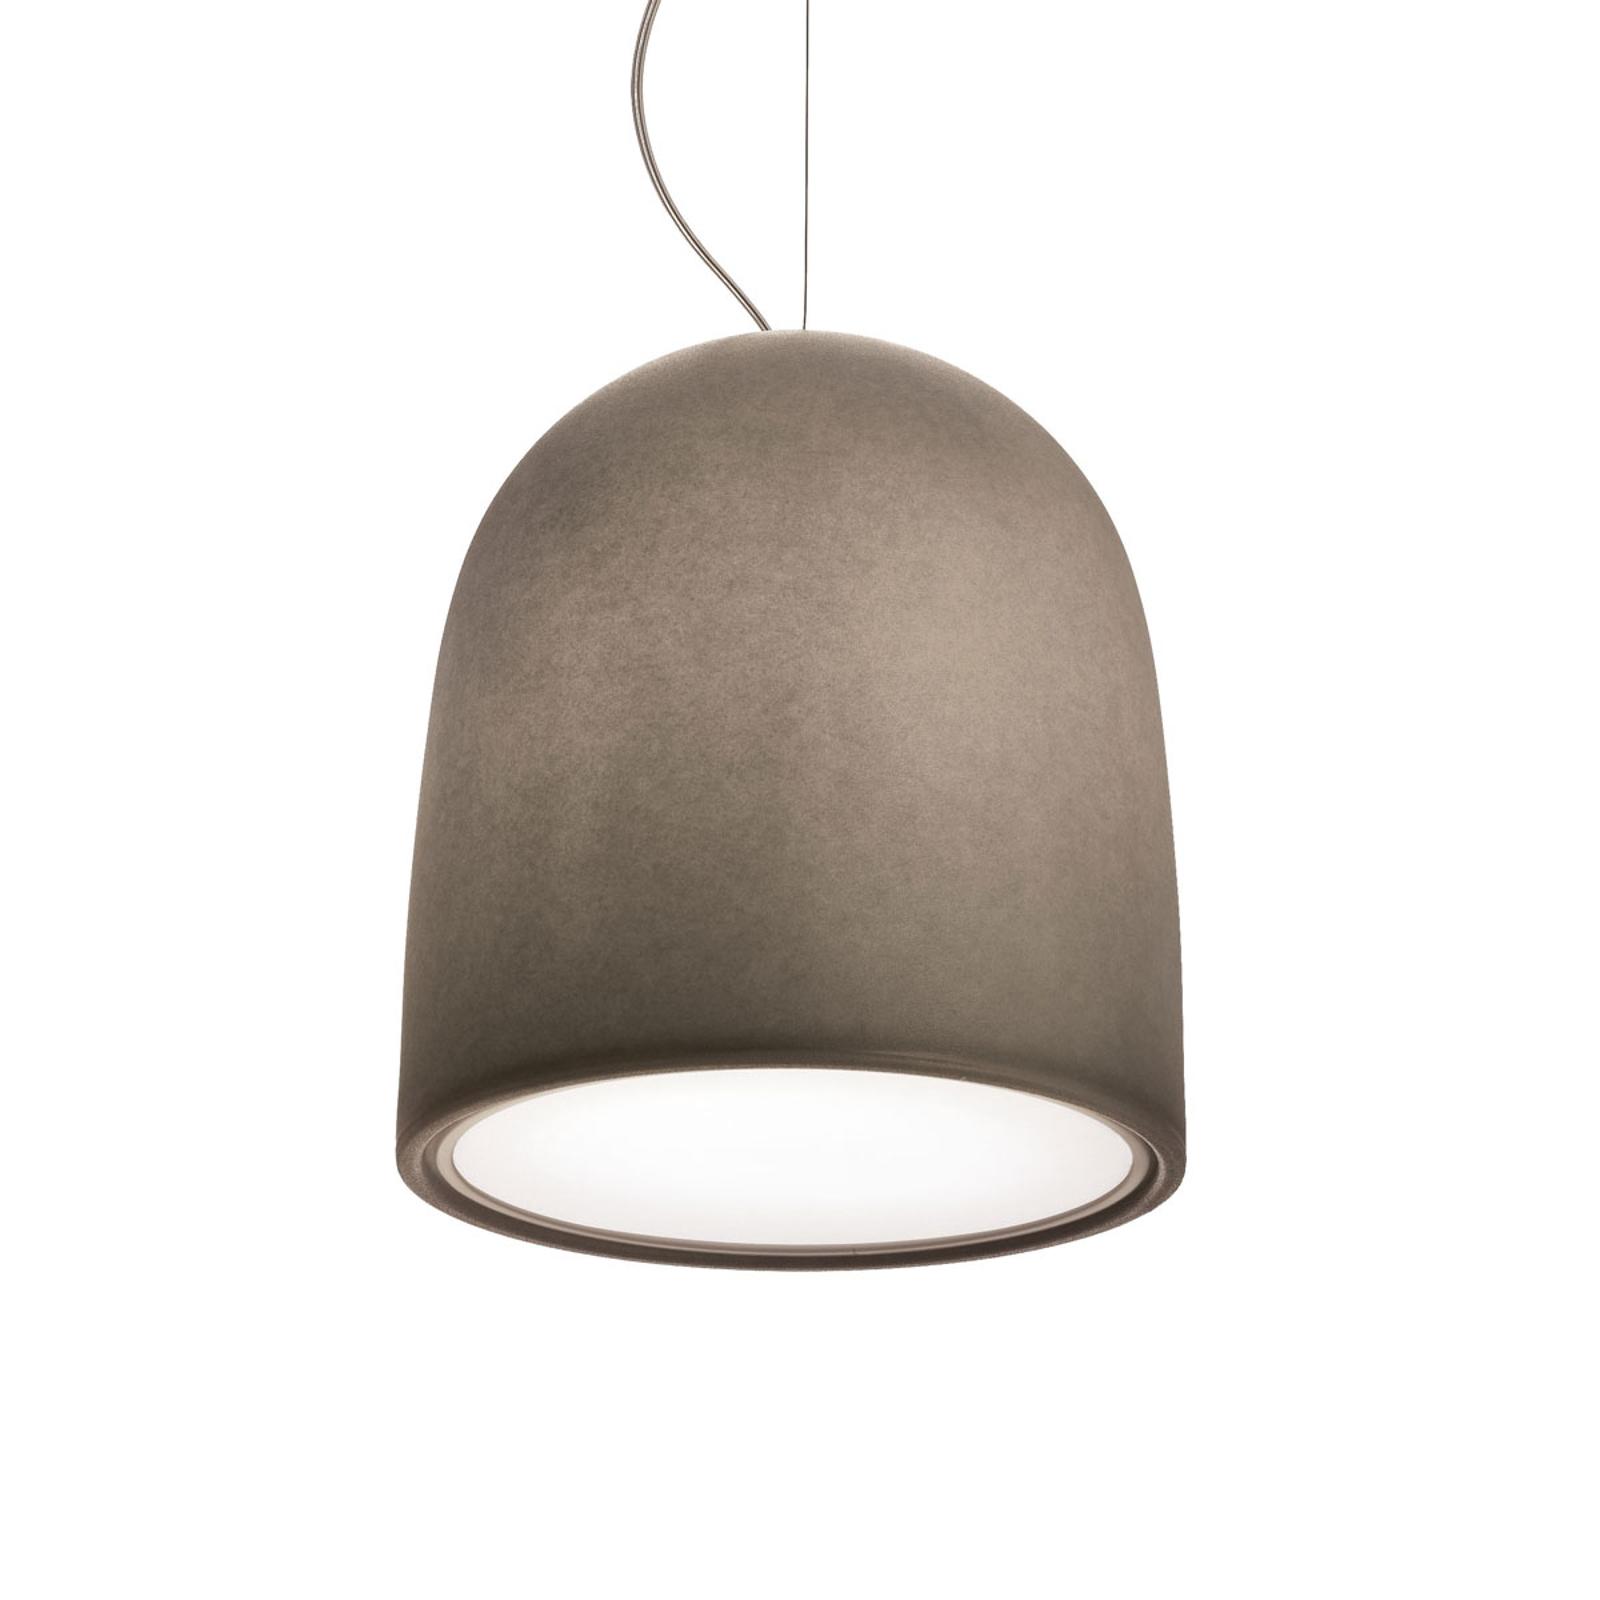 Modo Luce Campanone hanglamp Ø 33 cm donkergrijs